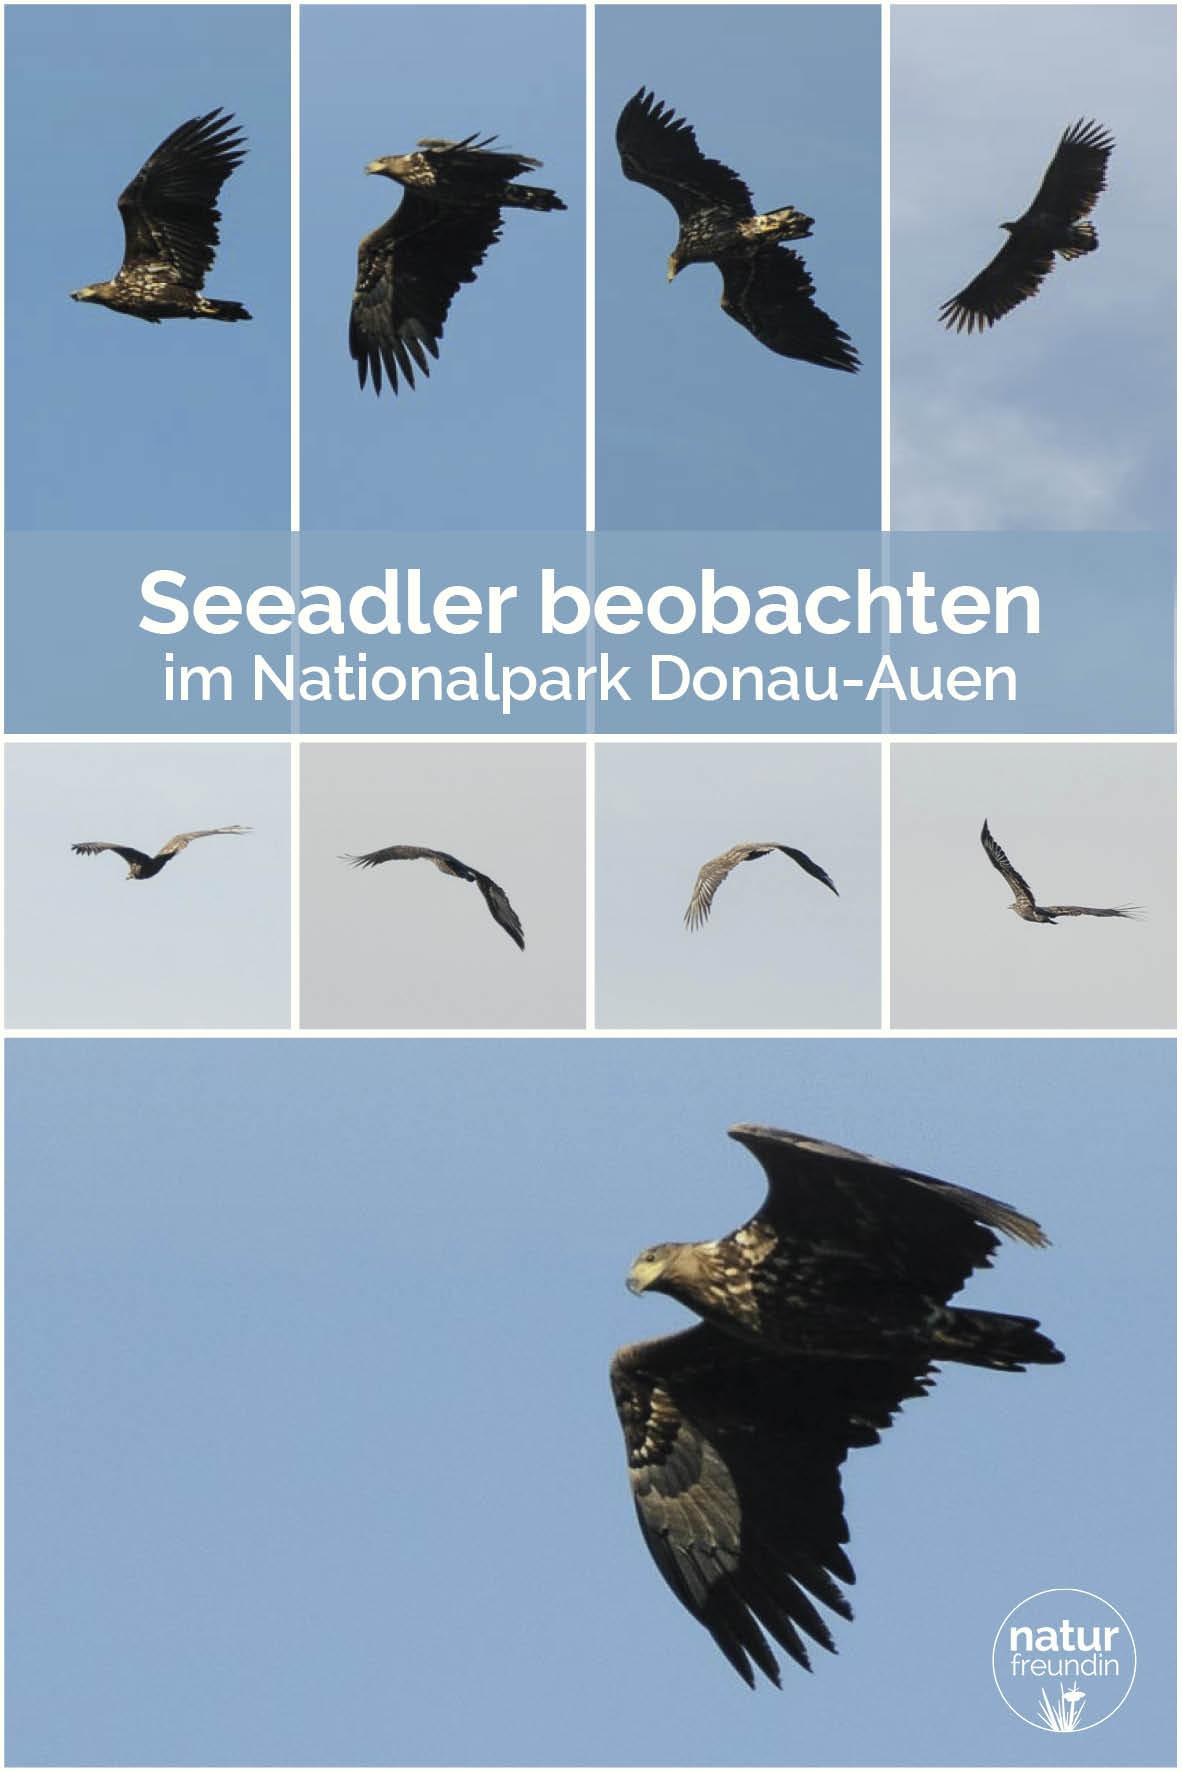 Seeadler im Nationalpark Donau-Auen